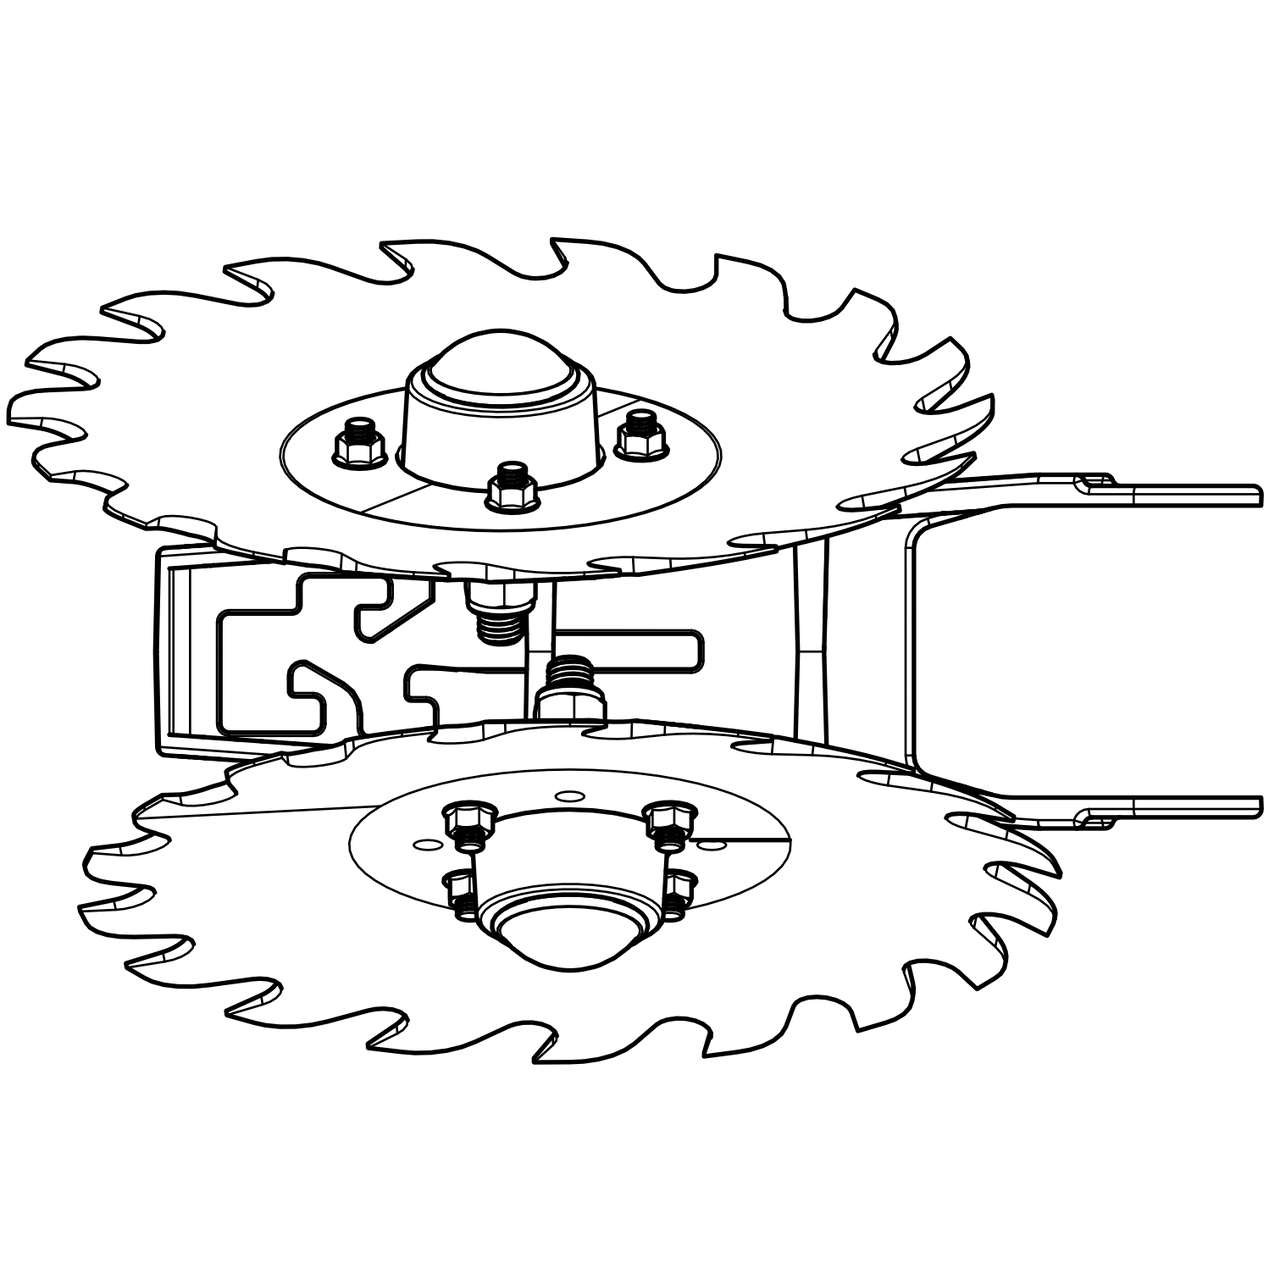 BSCW1444C